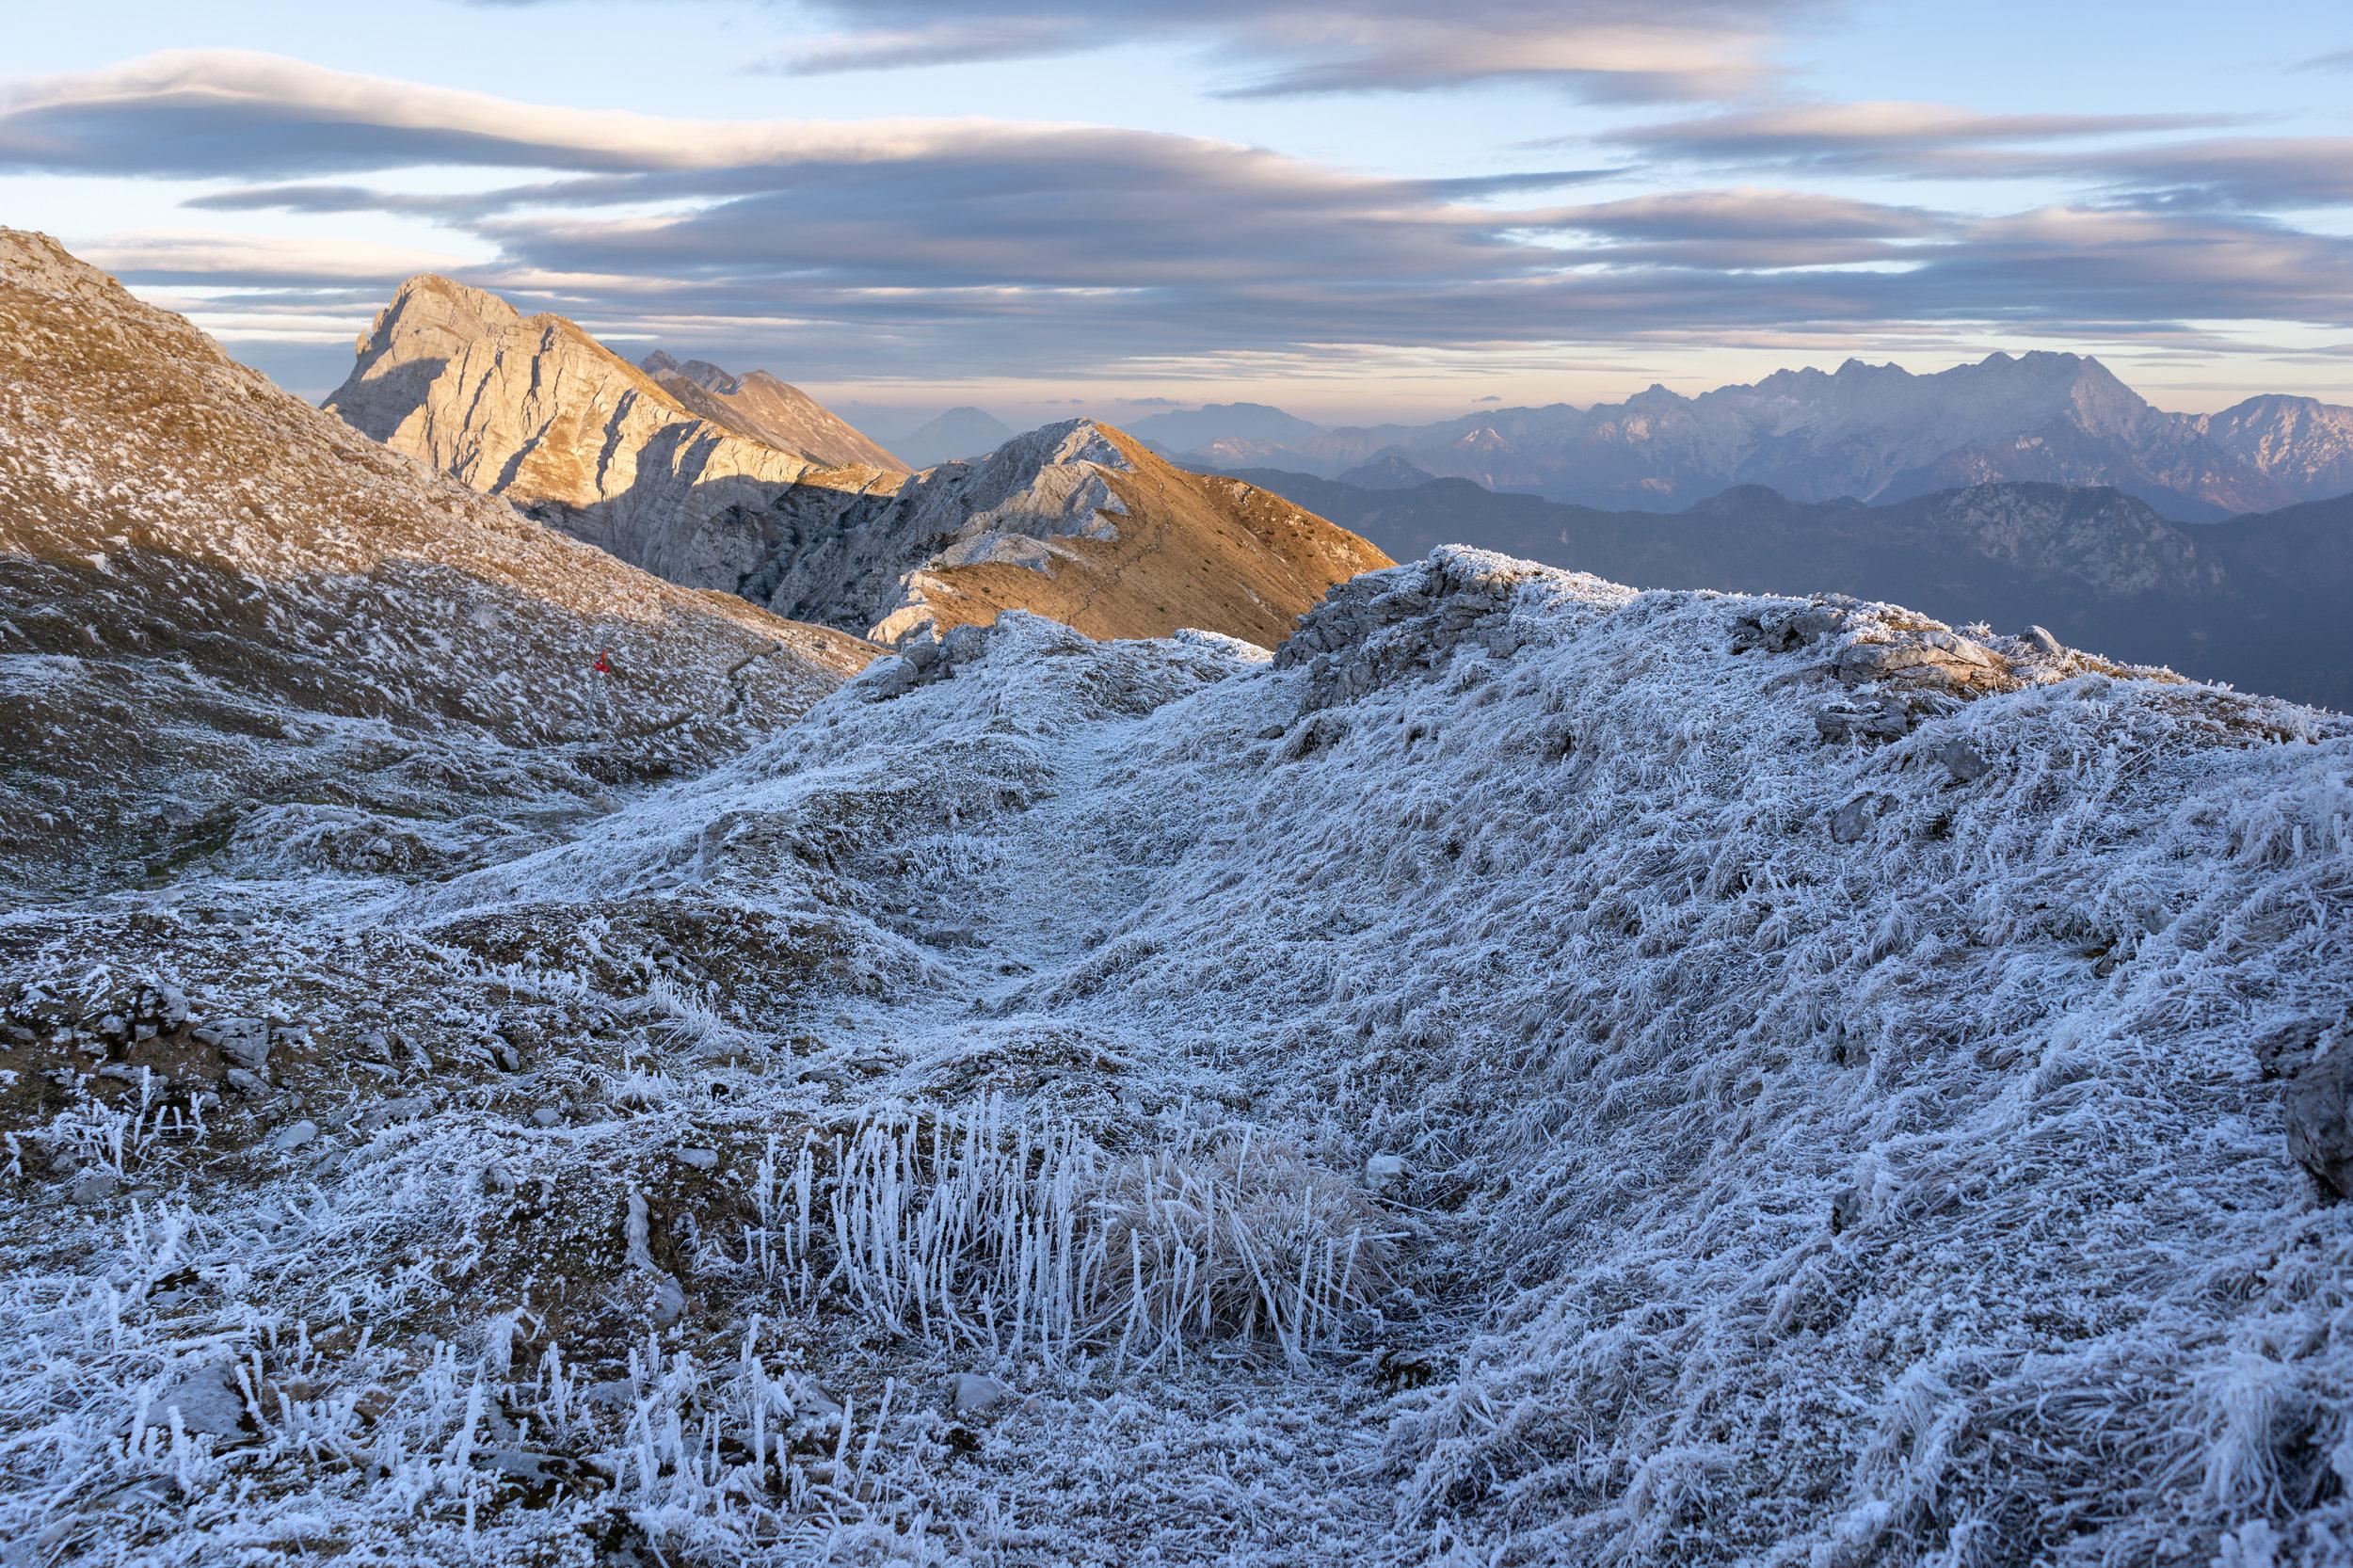 Košuta (Koschuta) is with more than 10 kilometers the longest mountain ridge in Slovenia.